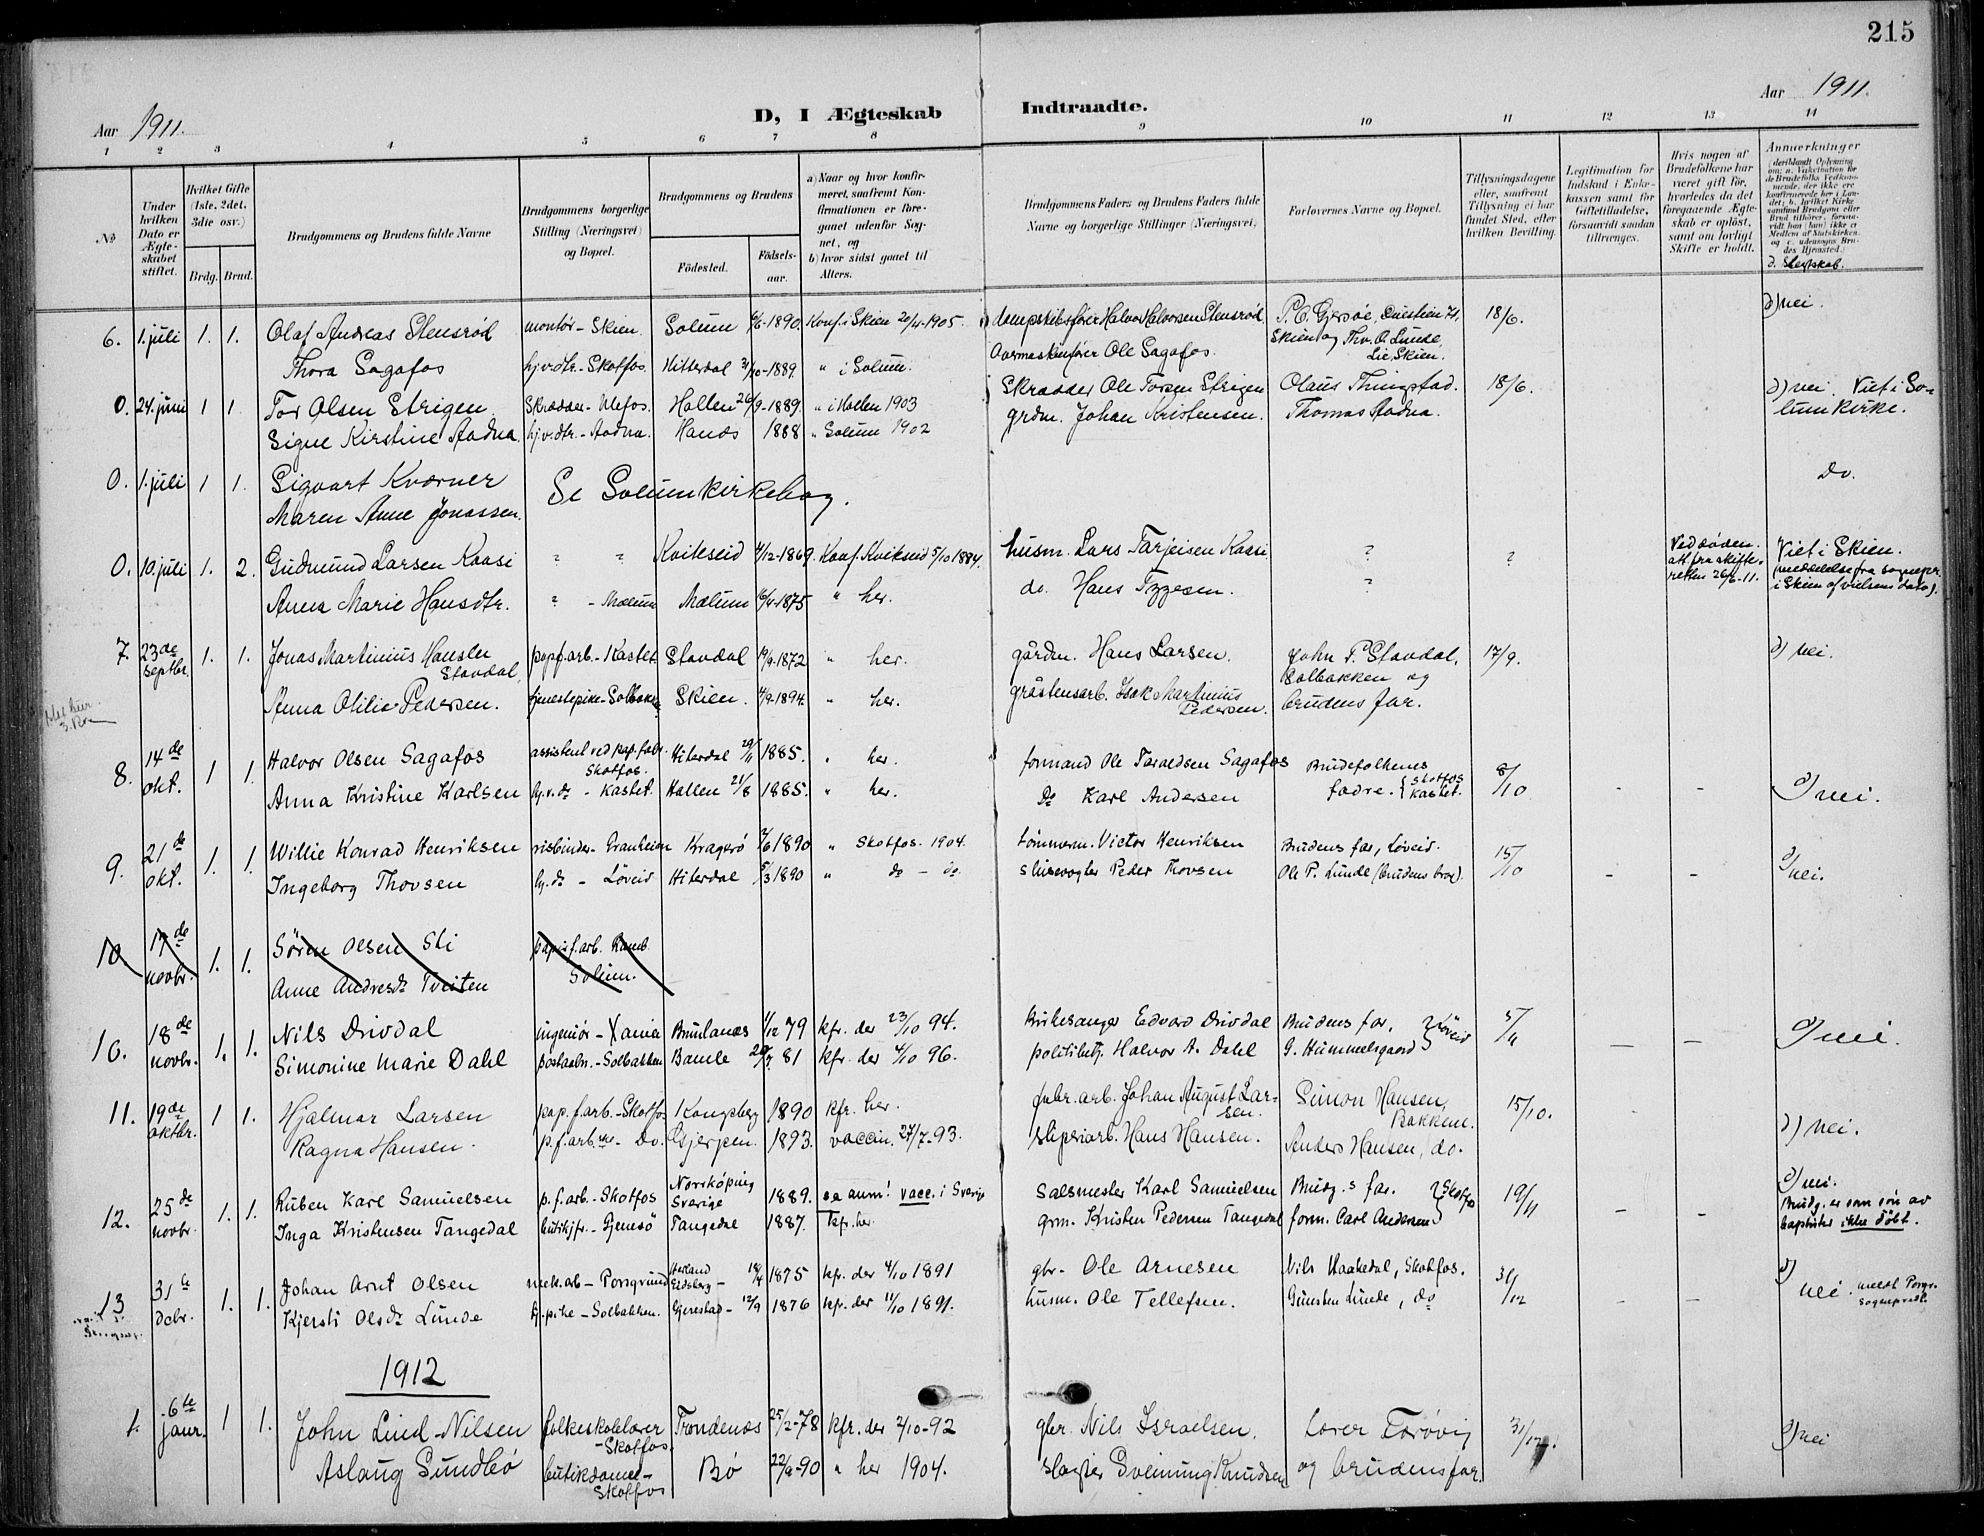 SAKO, Solum kirkebøker, F/Fb/L0003: Ministerialbok nr. II 3, 1901-1912, s. 215